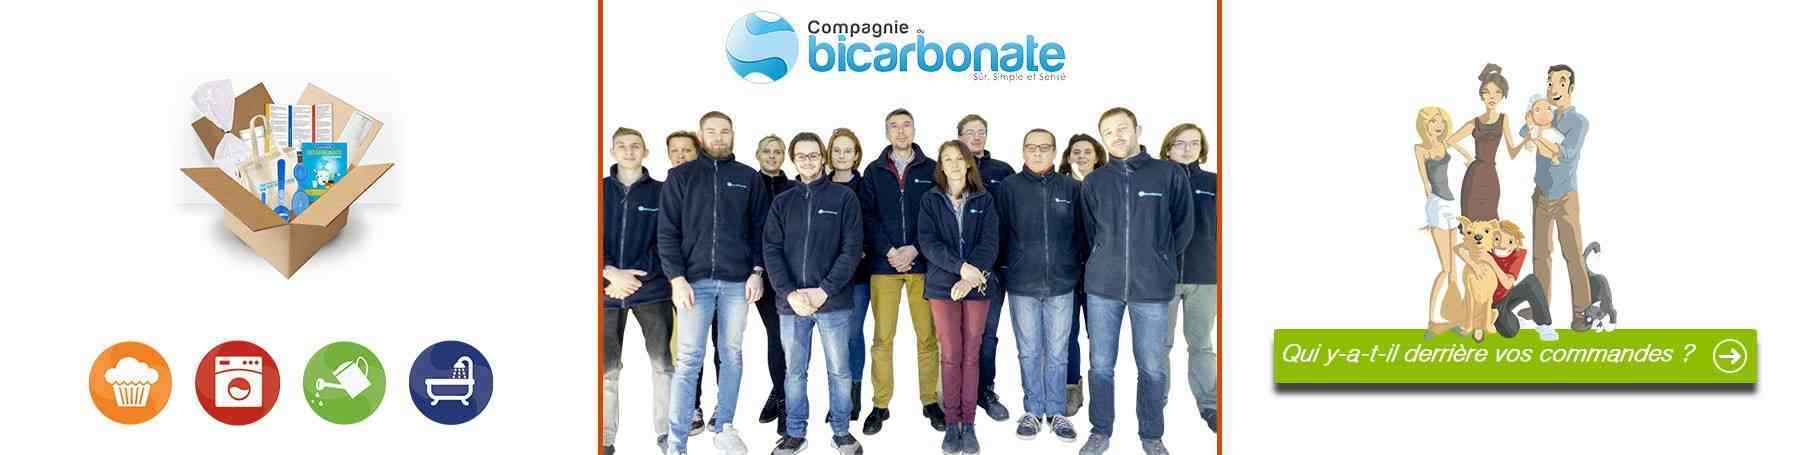 Equipe de la compagnie du bicarbonate